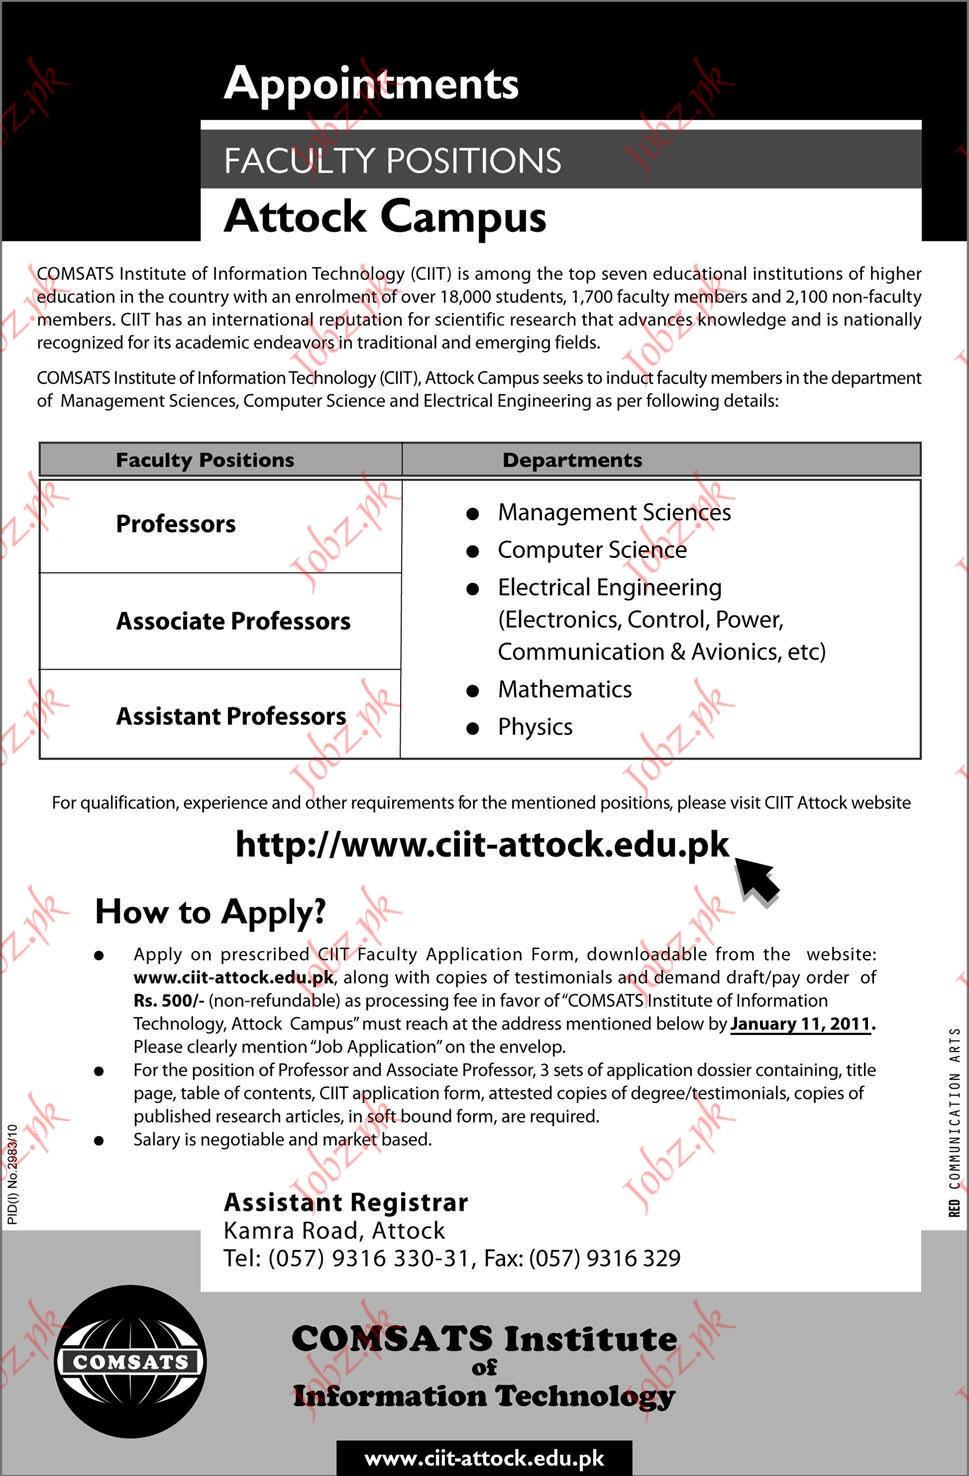 Professor, Associate Professor and Assistant Professor jobs